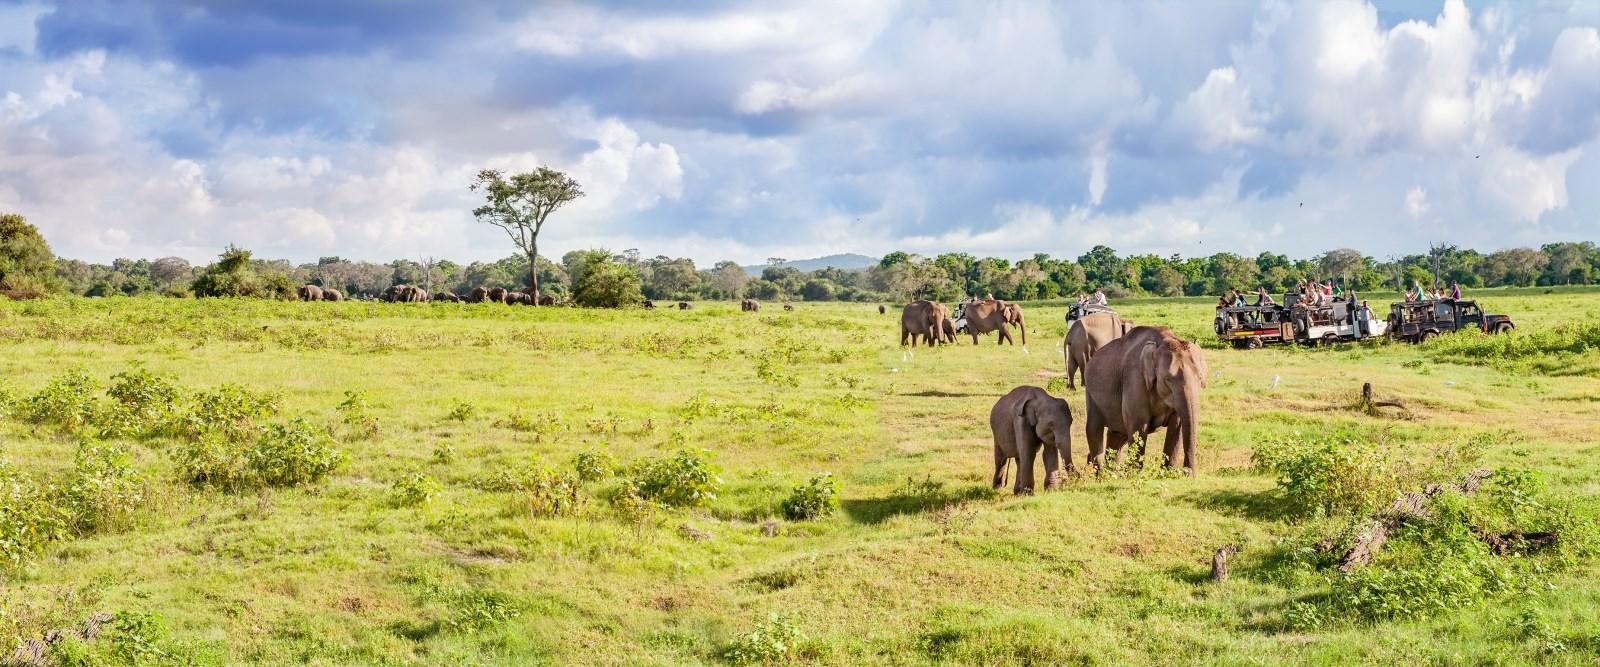 Safari with Elephants